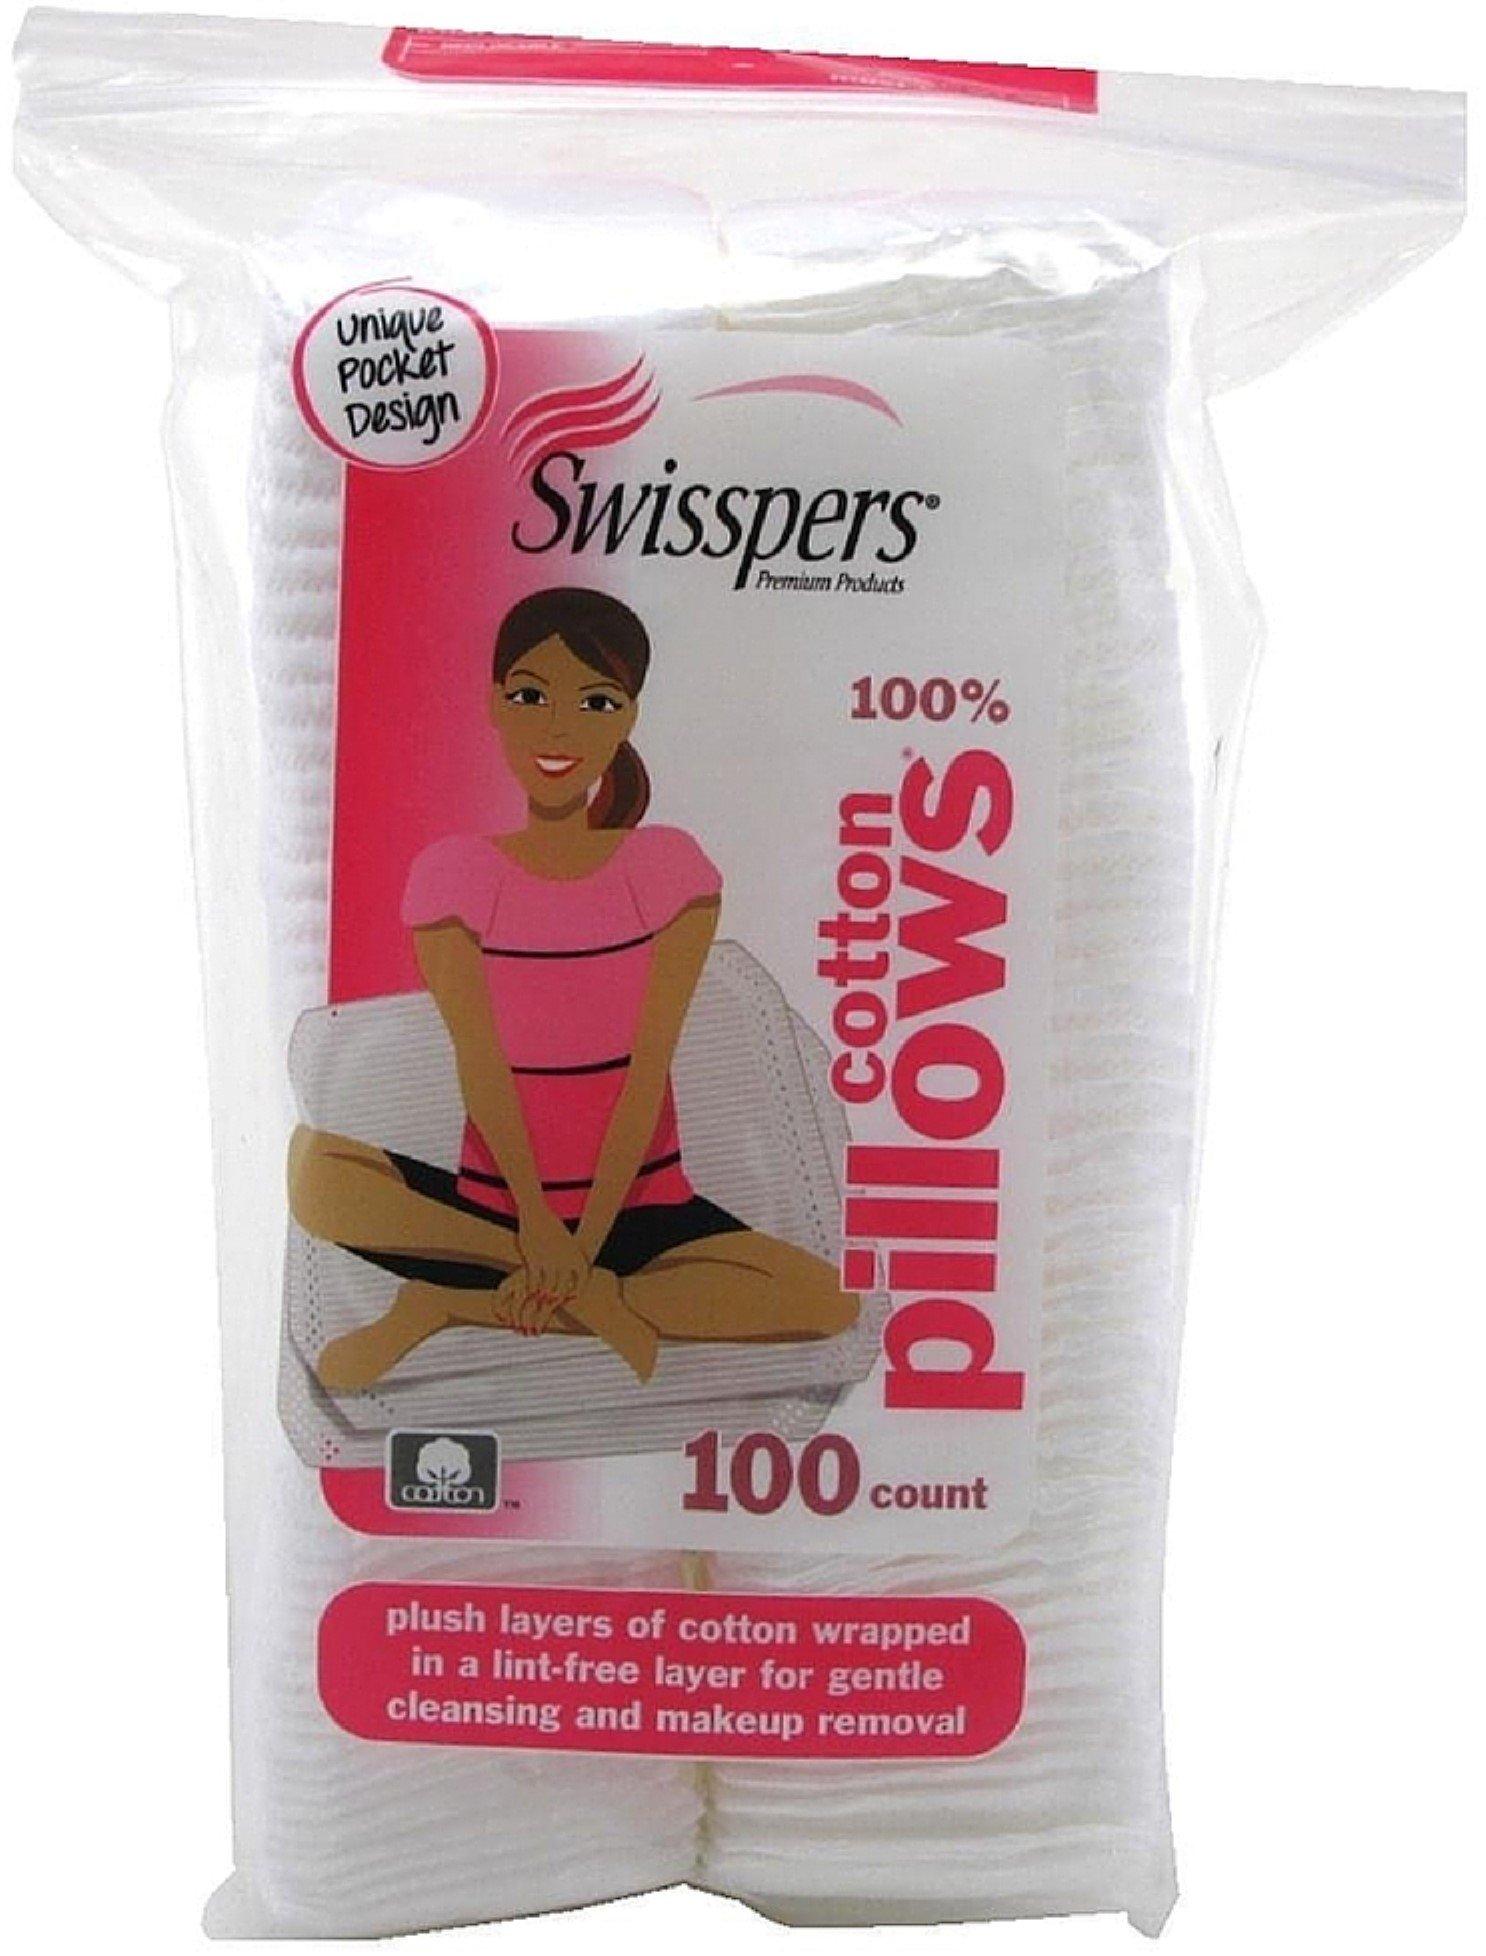 Swisspers Premium Cotton Squares Pillows 100 ea (Pack of 7)